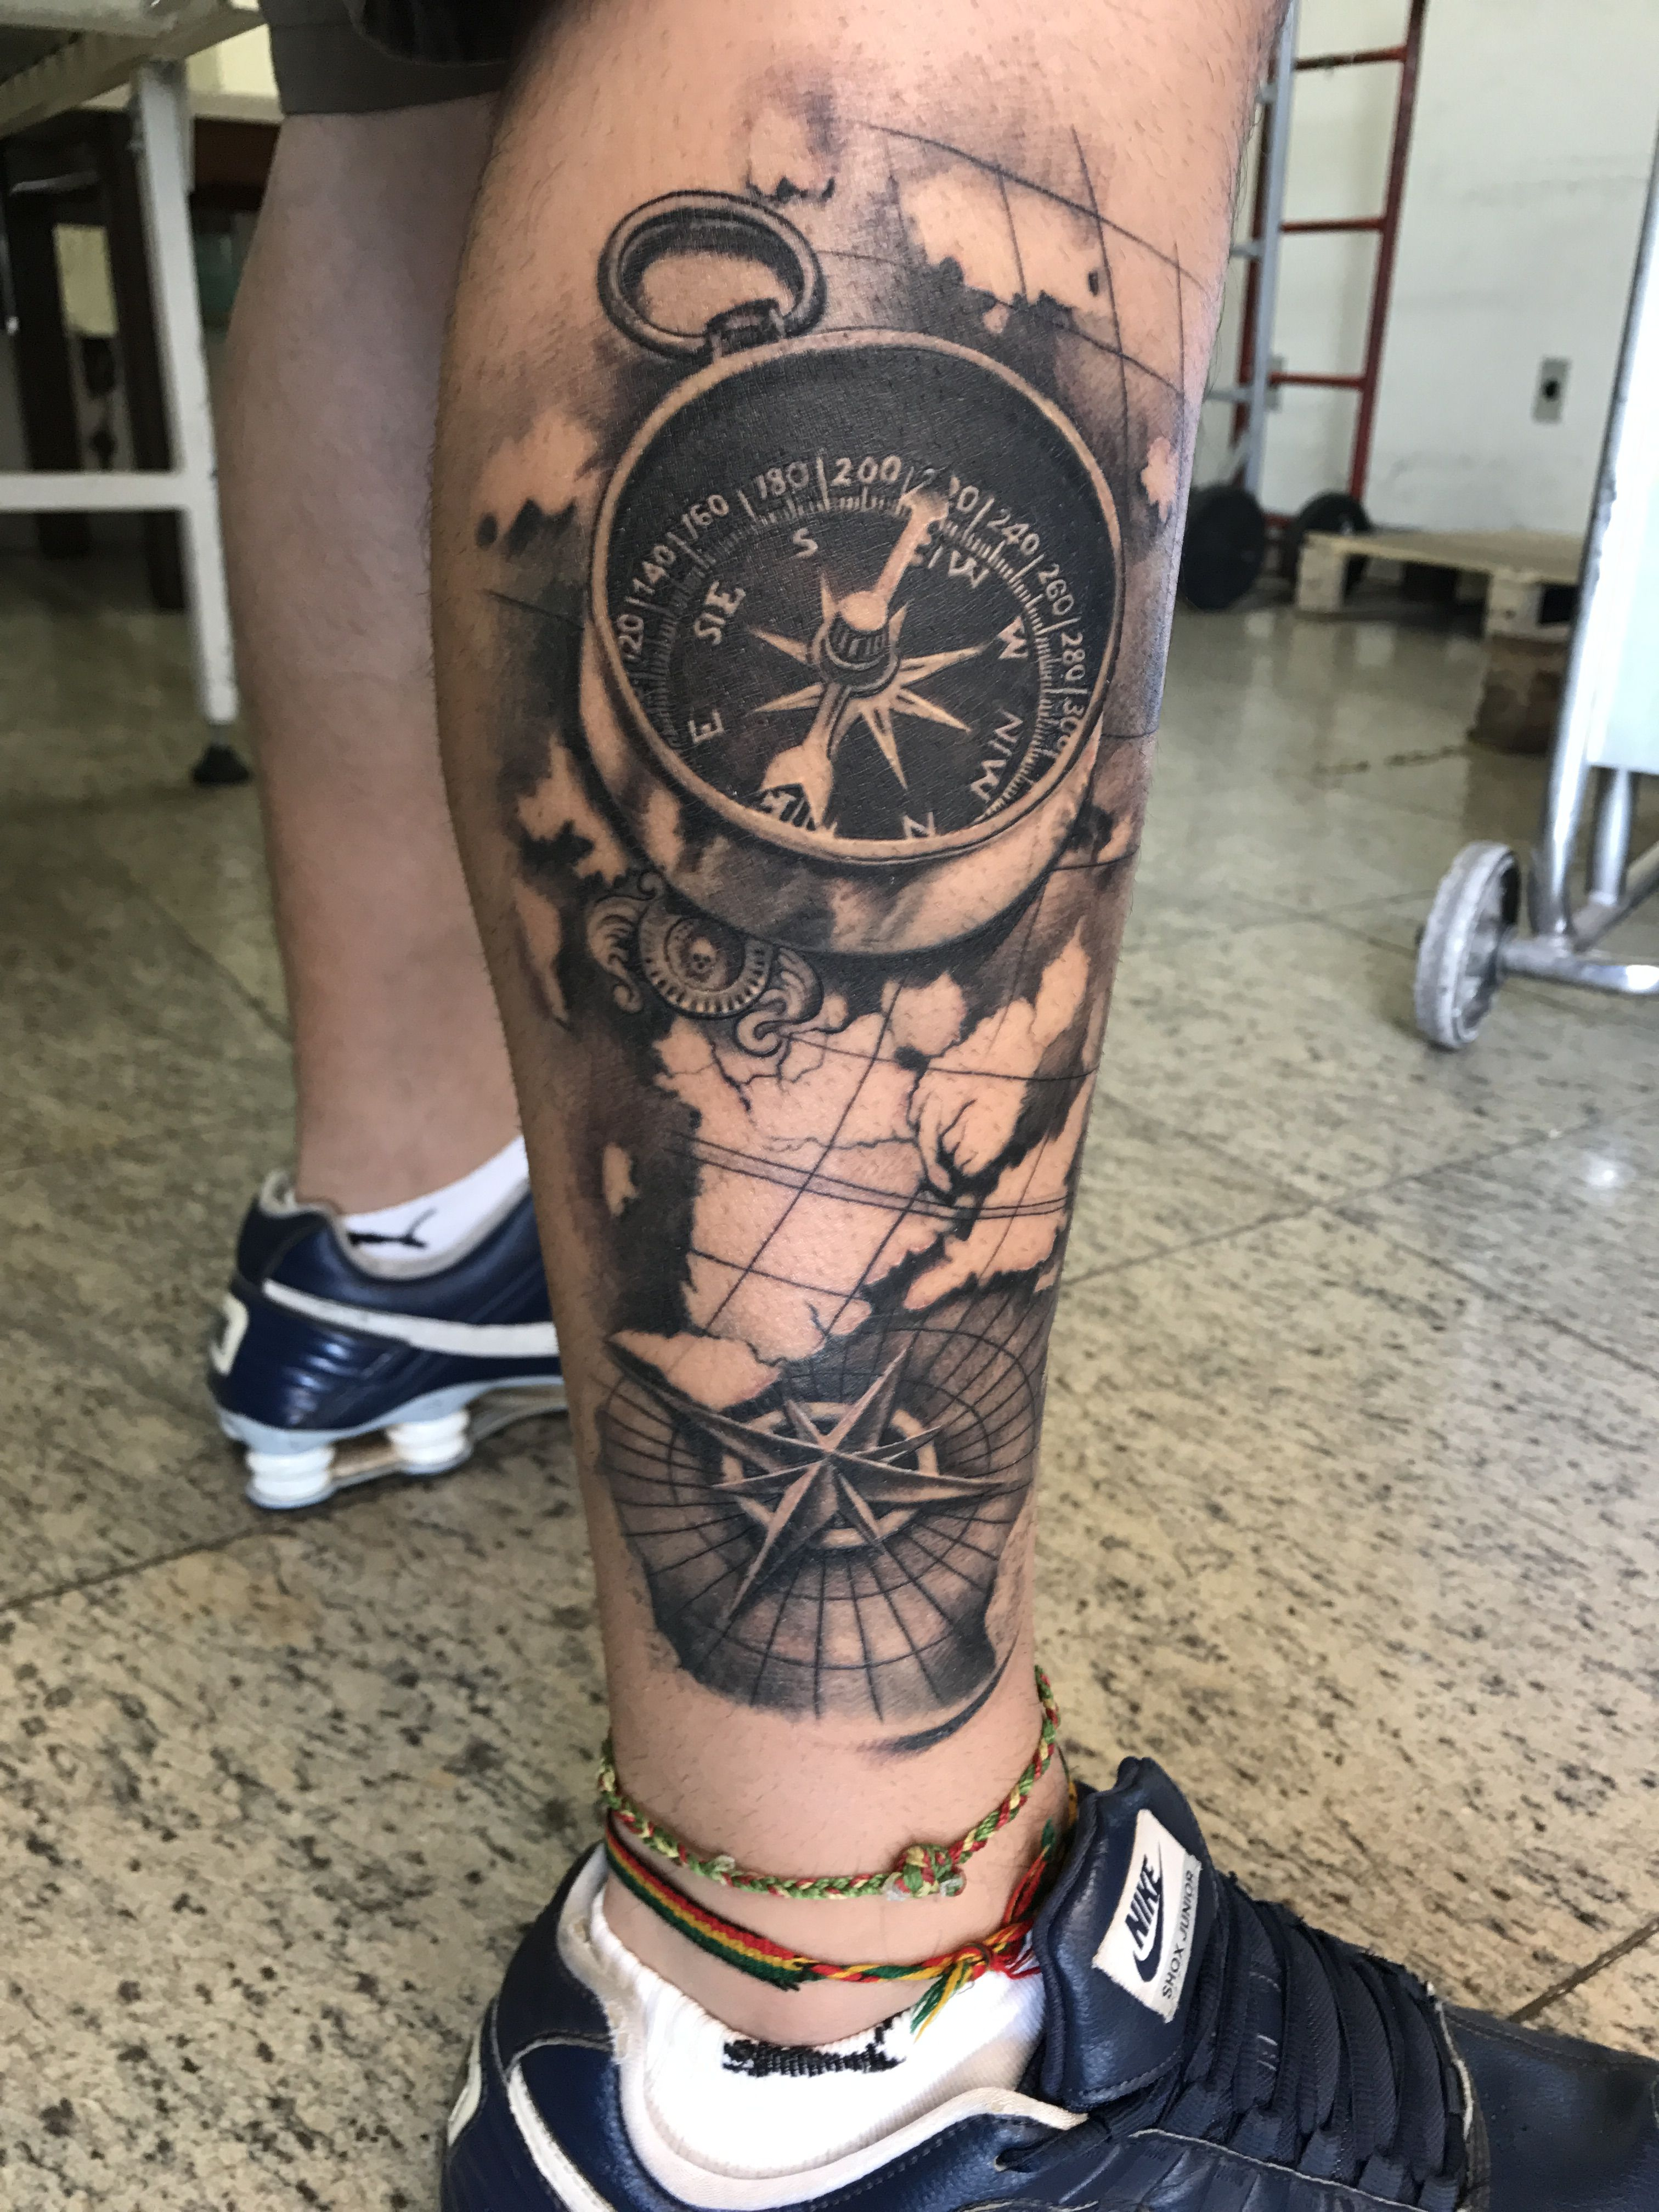 Tattoo ubiratanamorim bussola ubiratanamorim compass for Tatoo bussola